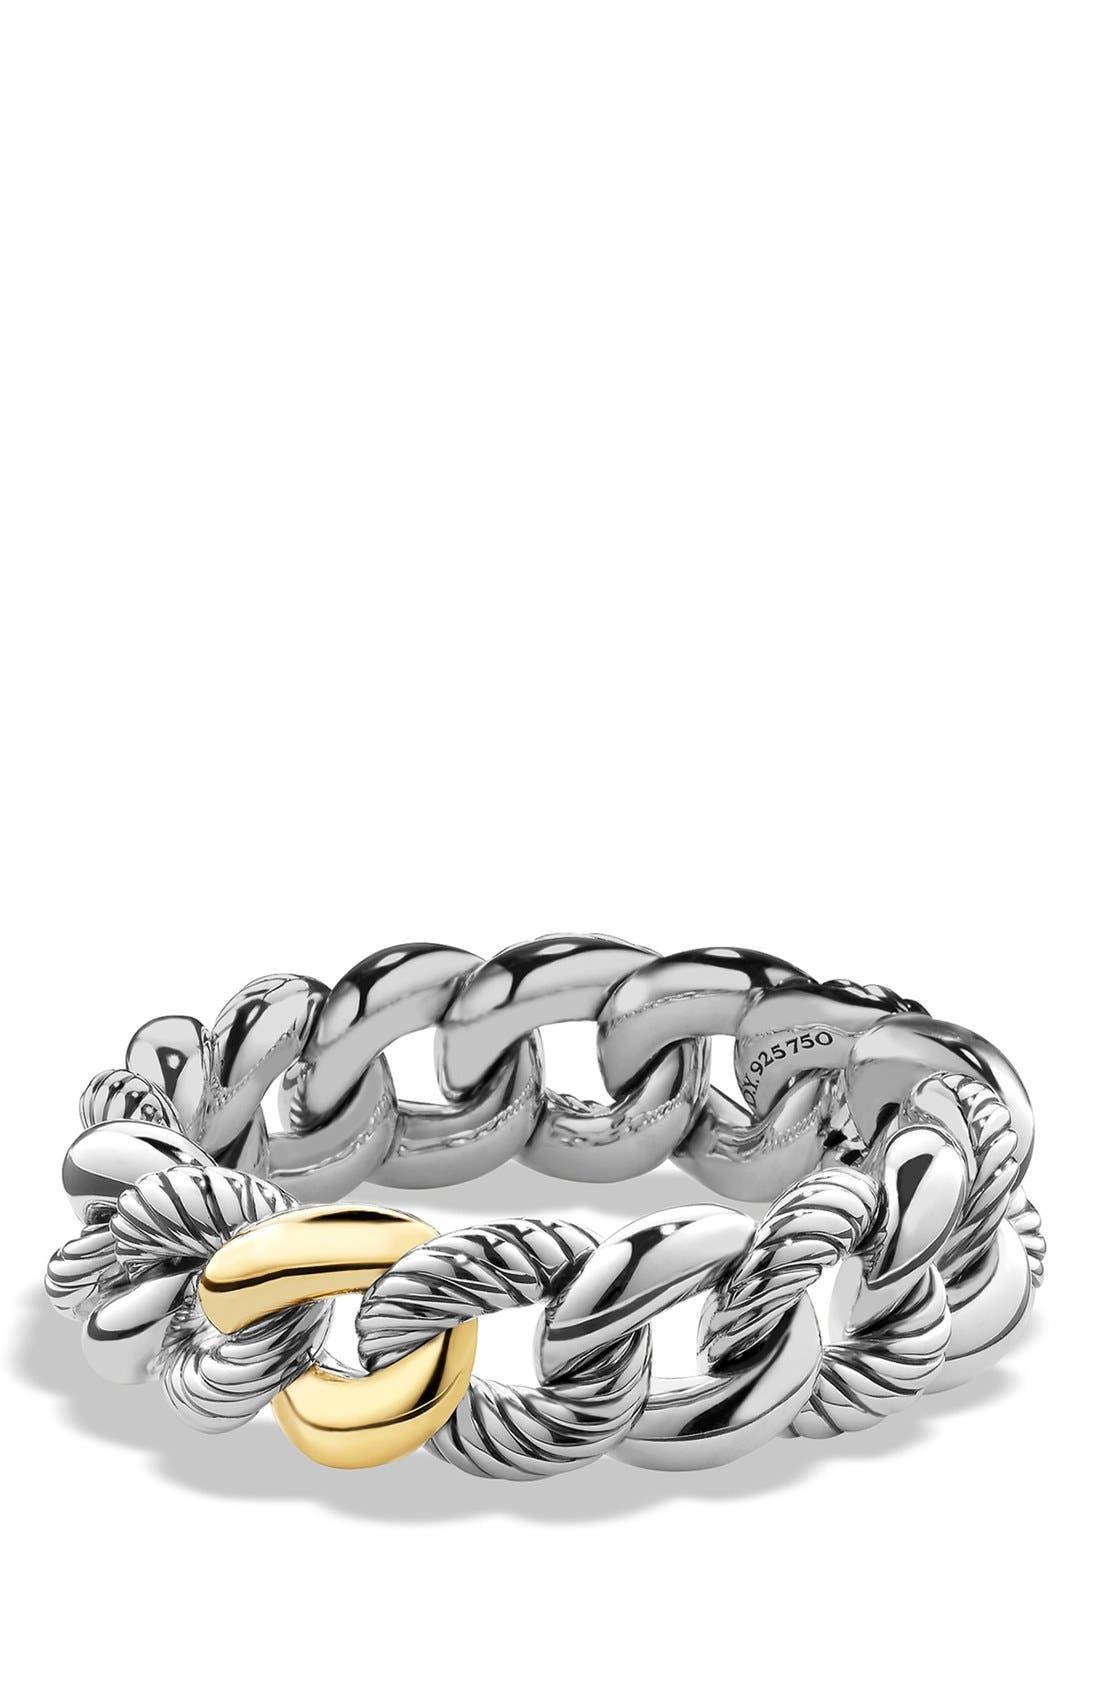 Main Image - David Yurman'Belmont' Curb Link Bracelet with 18K Gold